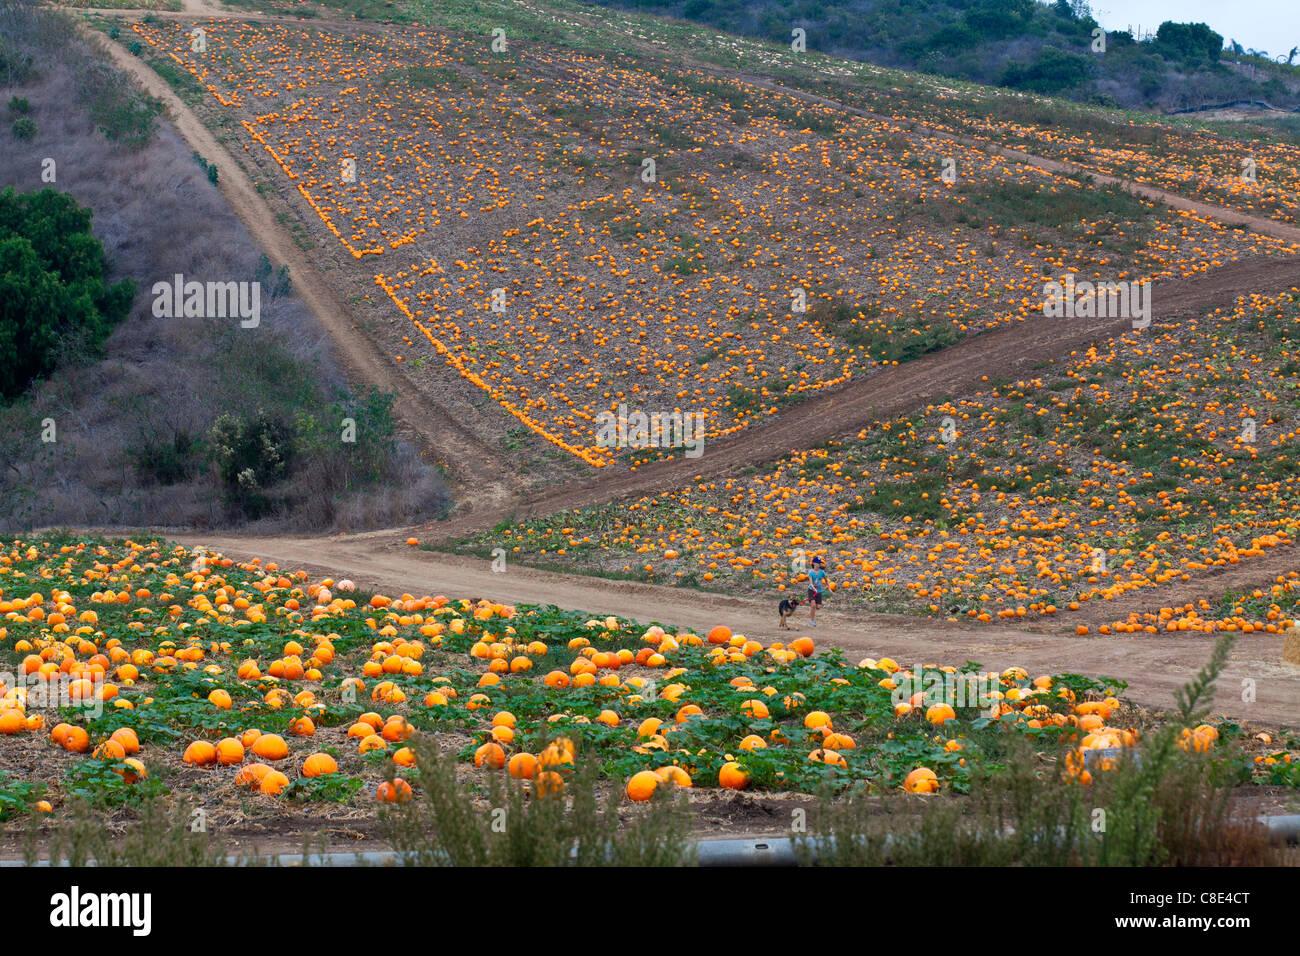 a-pumpkin-patch-near-oxnard-california-C8E4CT.jpg